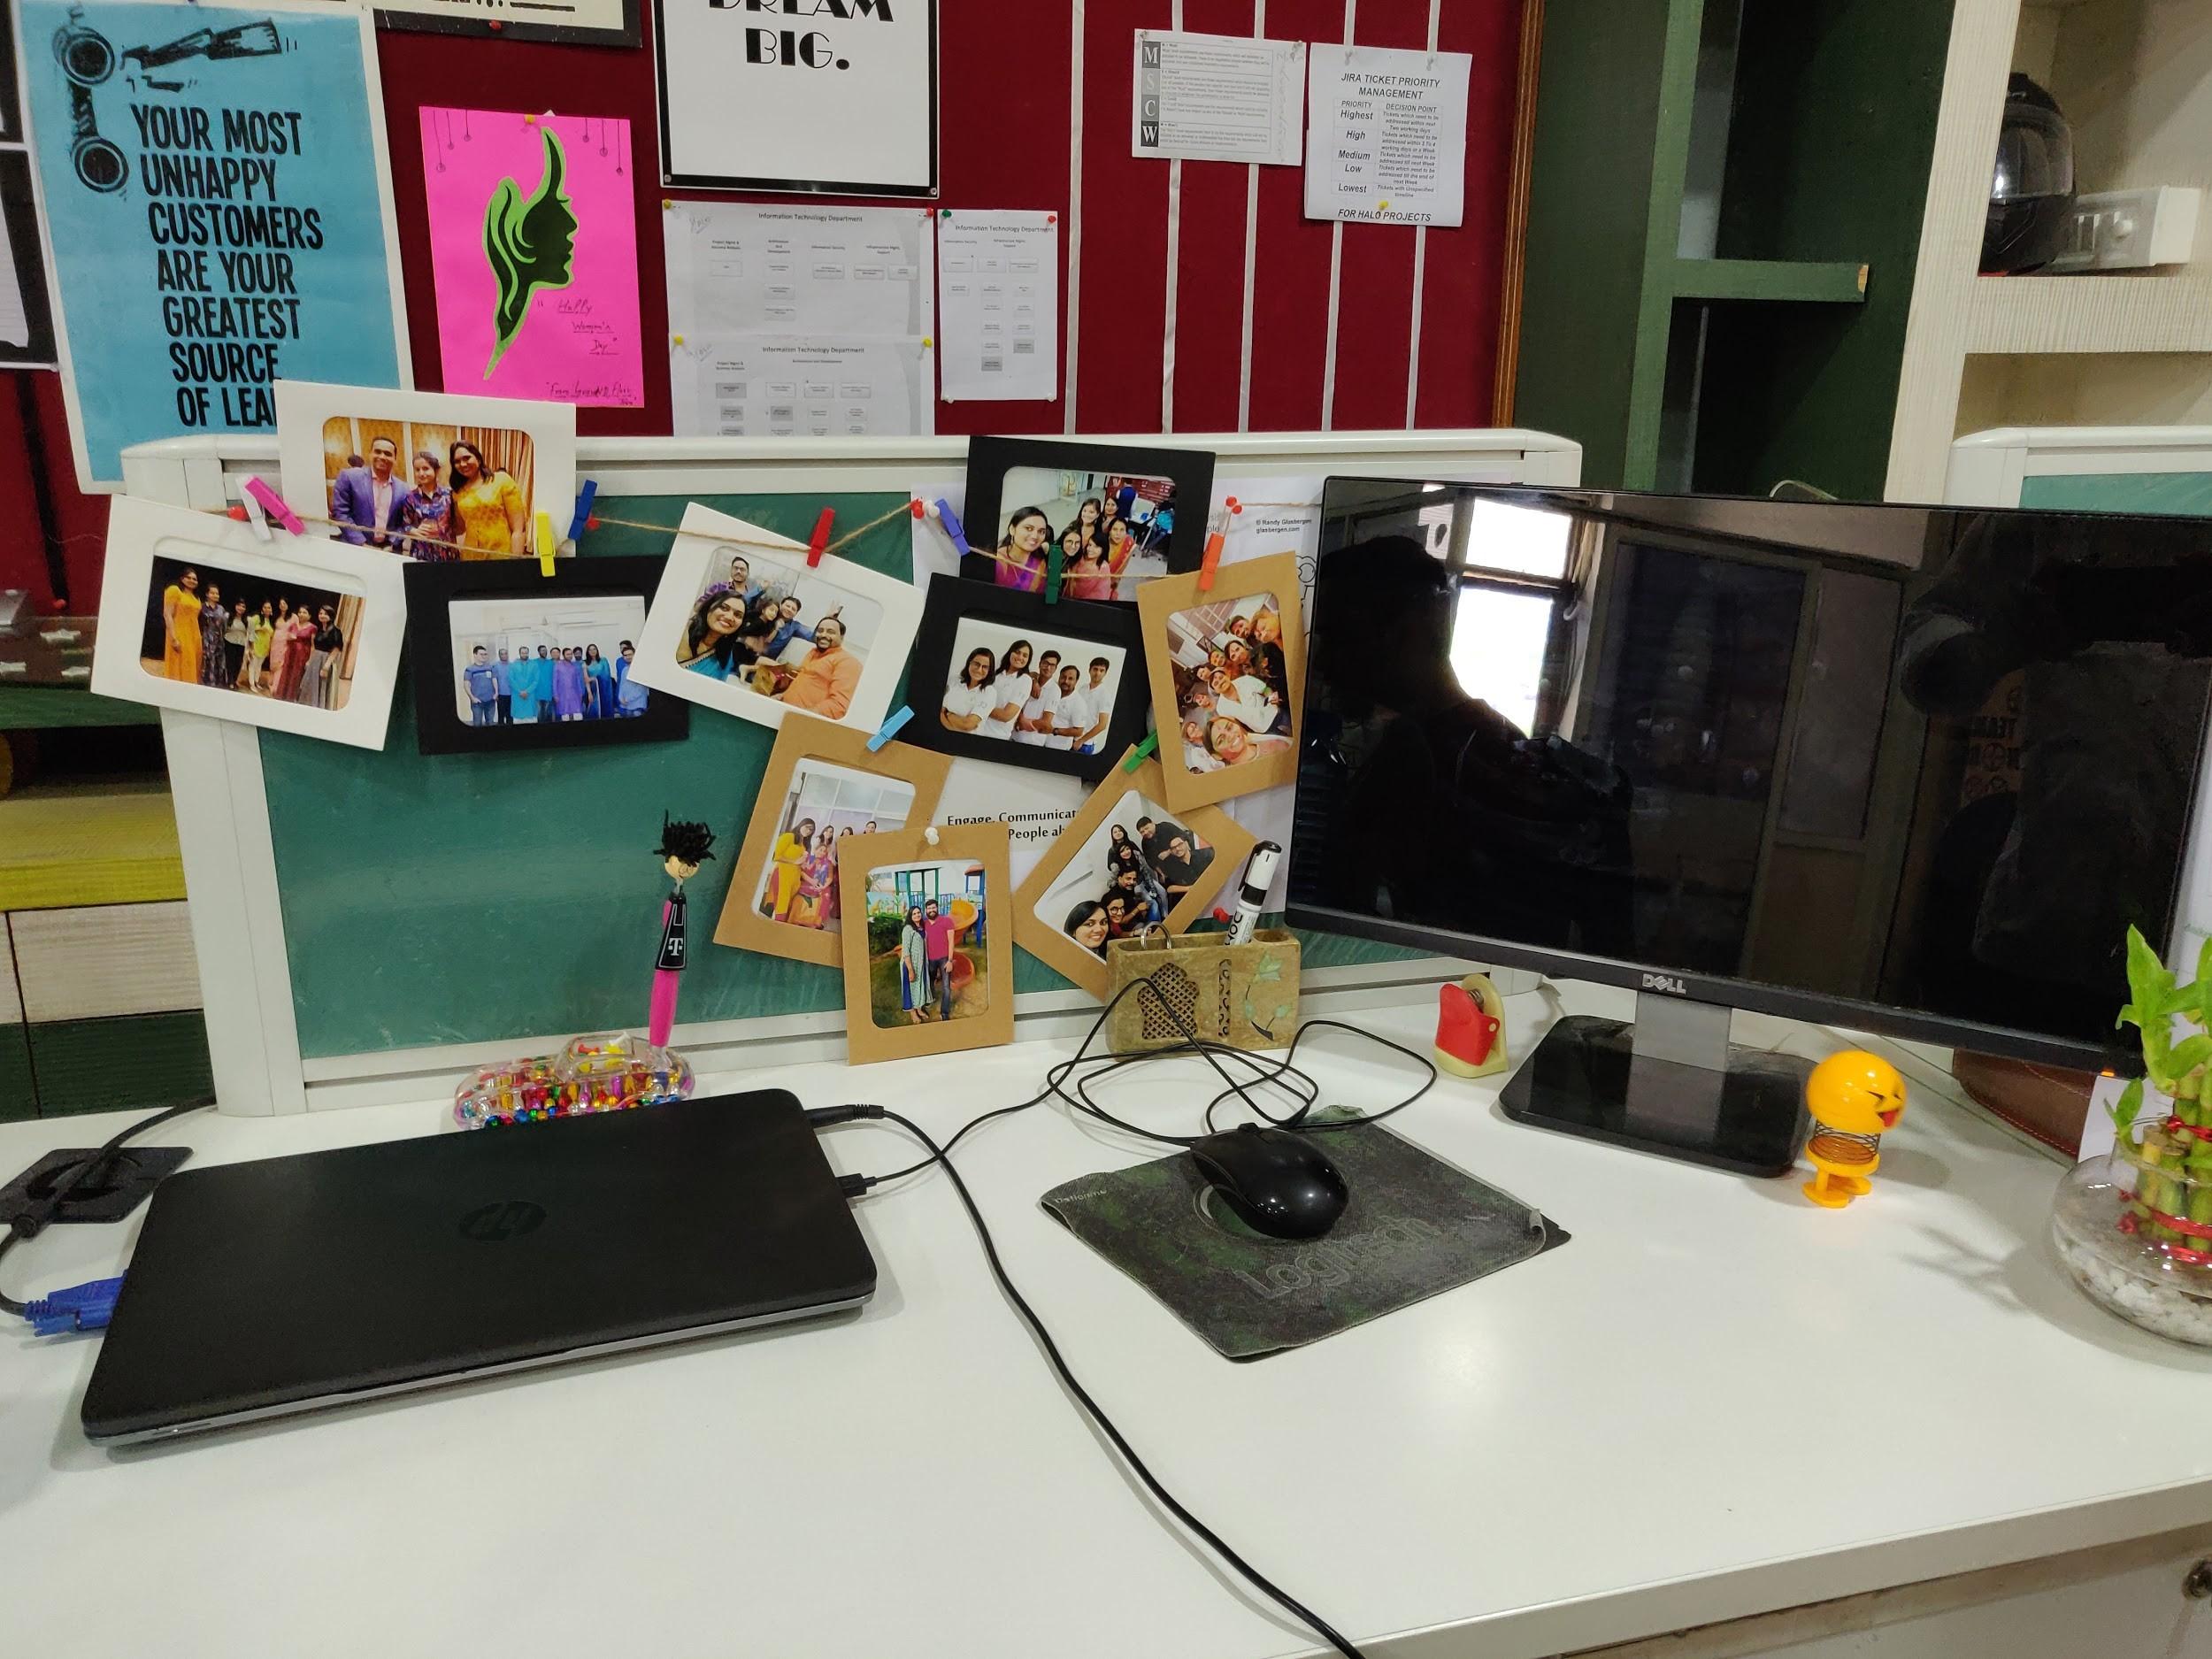 Saumya Agarwal workspace